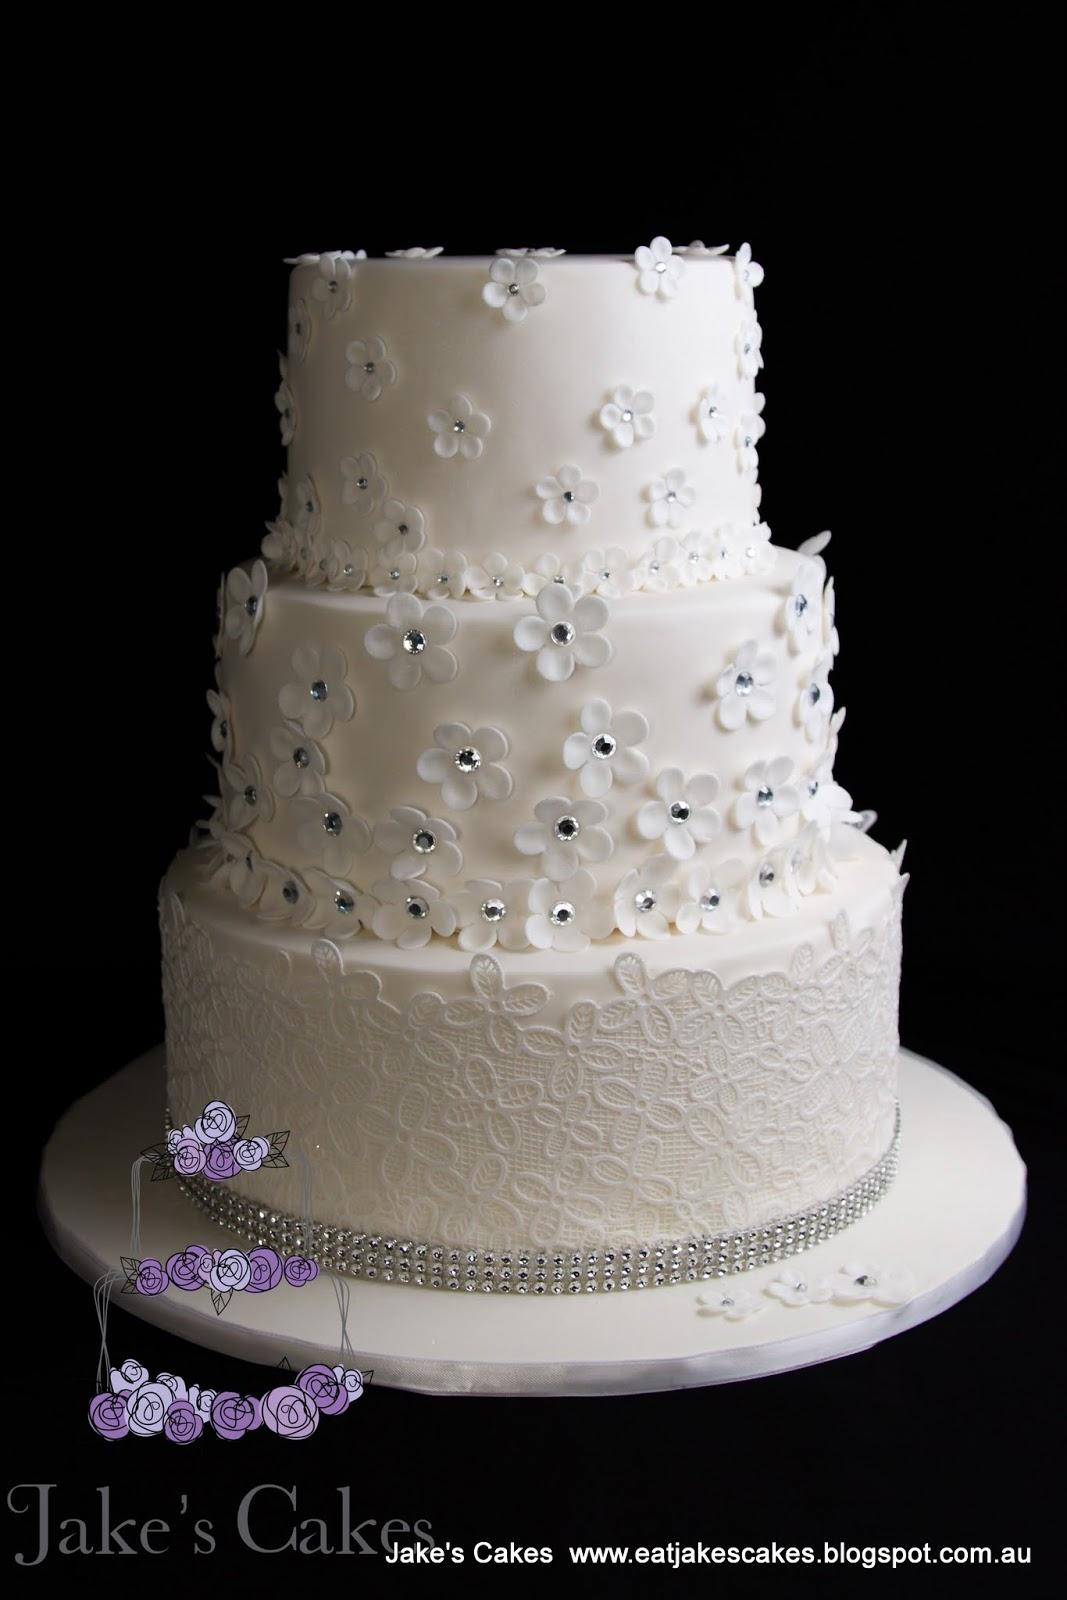 edible bling wedding cake ideas and designs. Black Bedroom Furniture Sets. Home Design Ideas